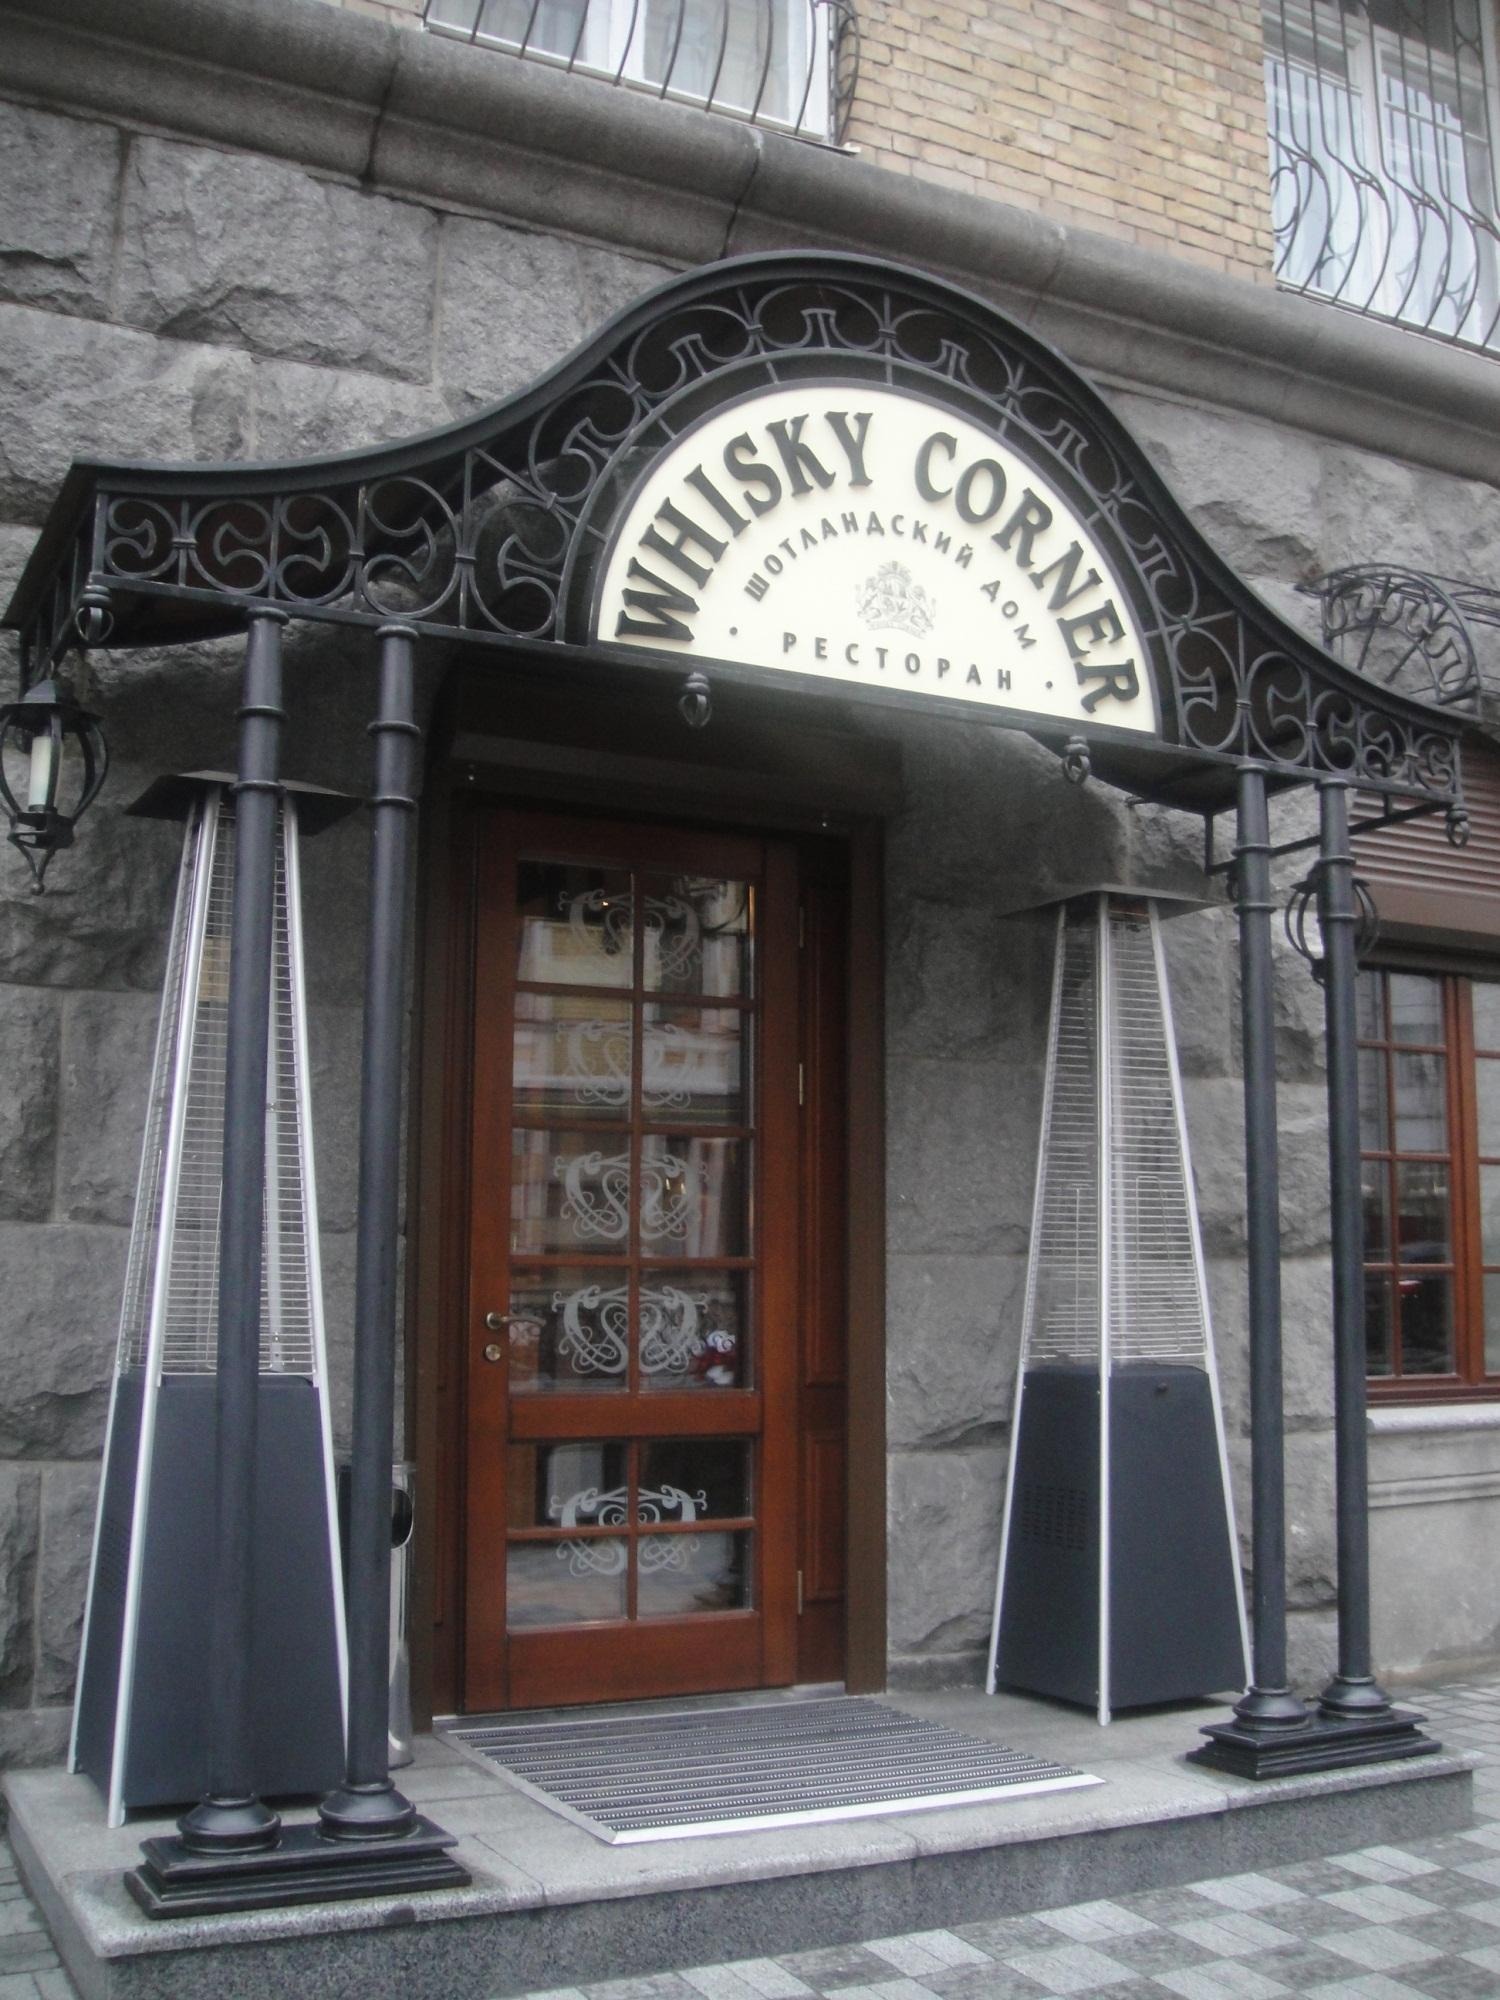 Ресторан Whisky corner, г. Киев